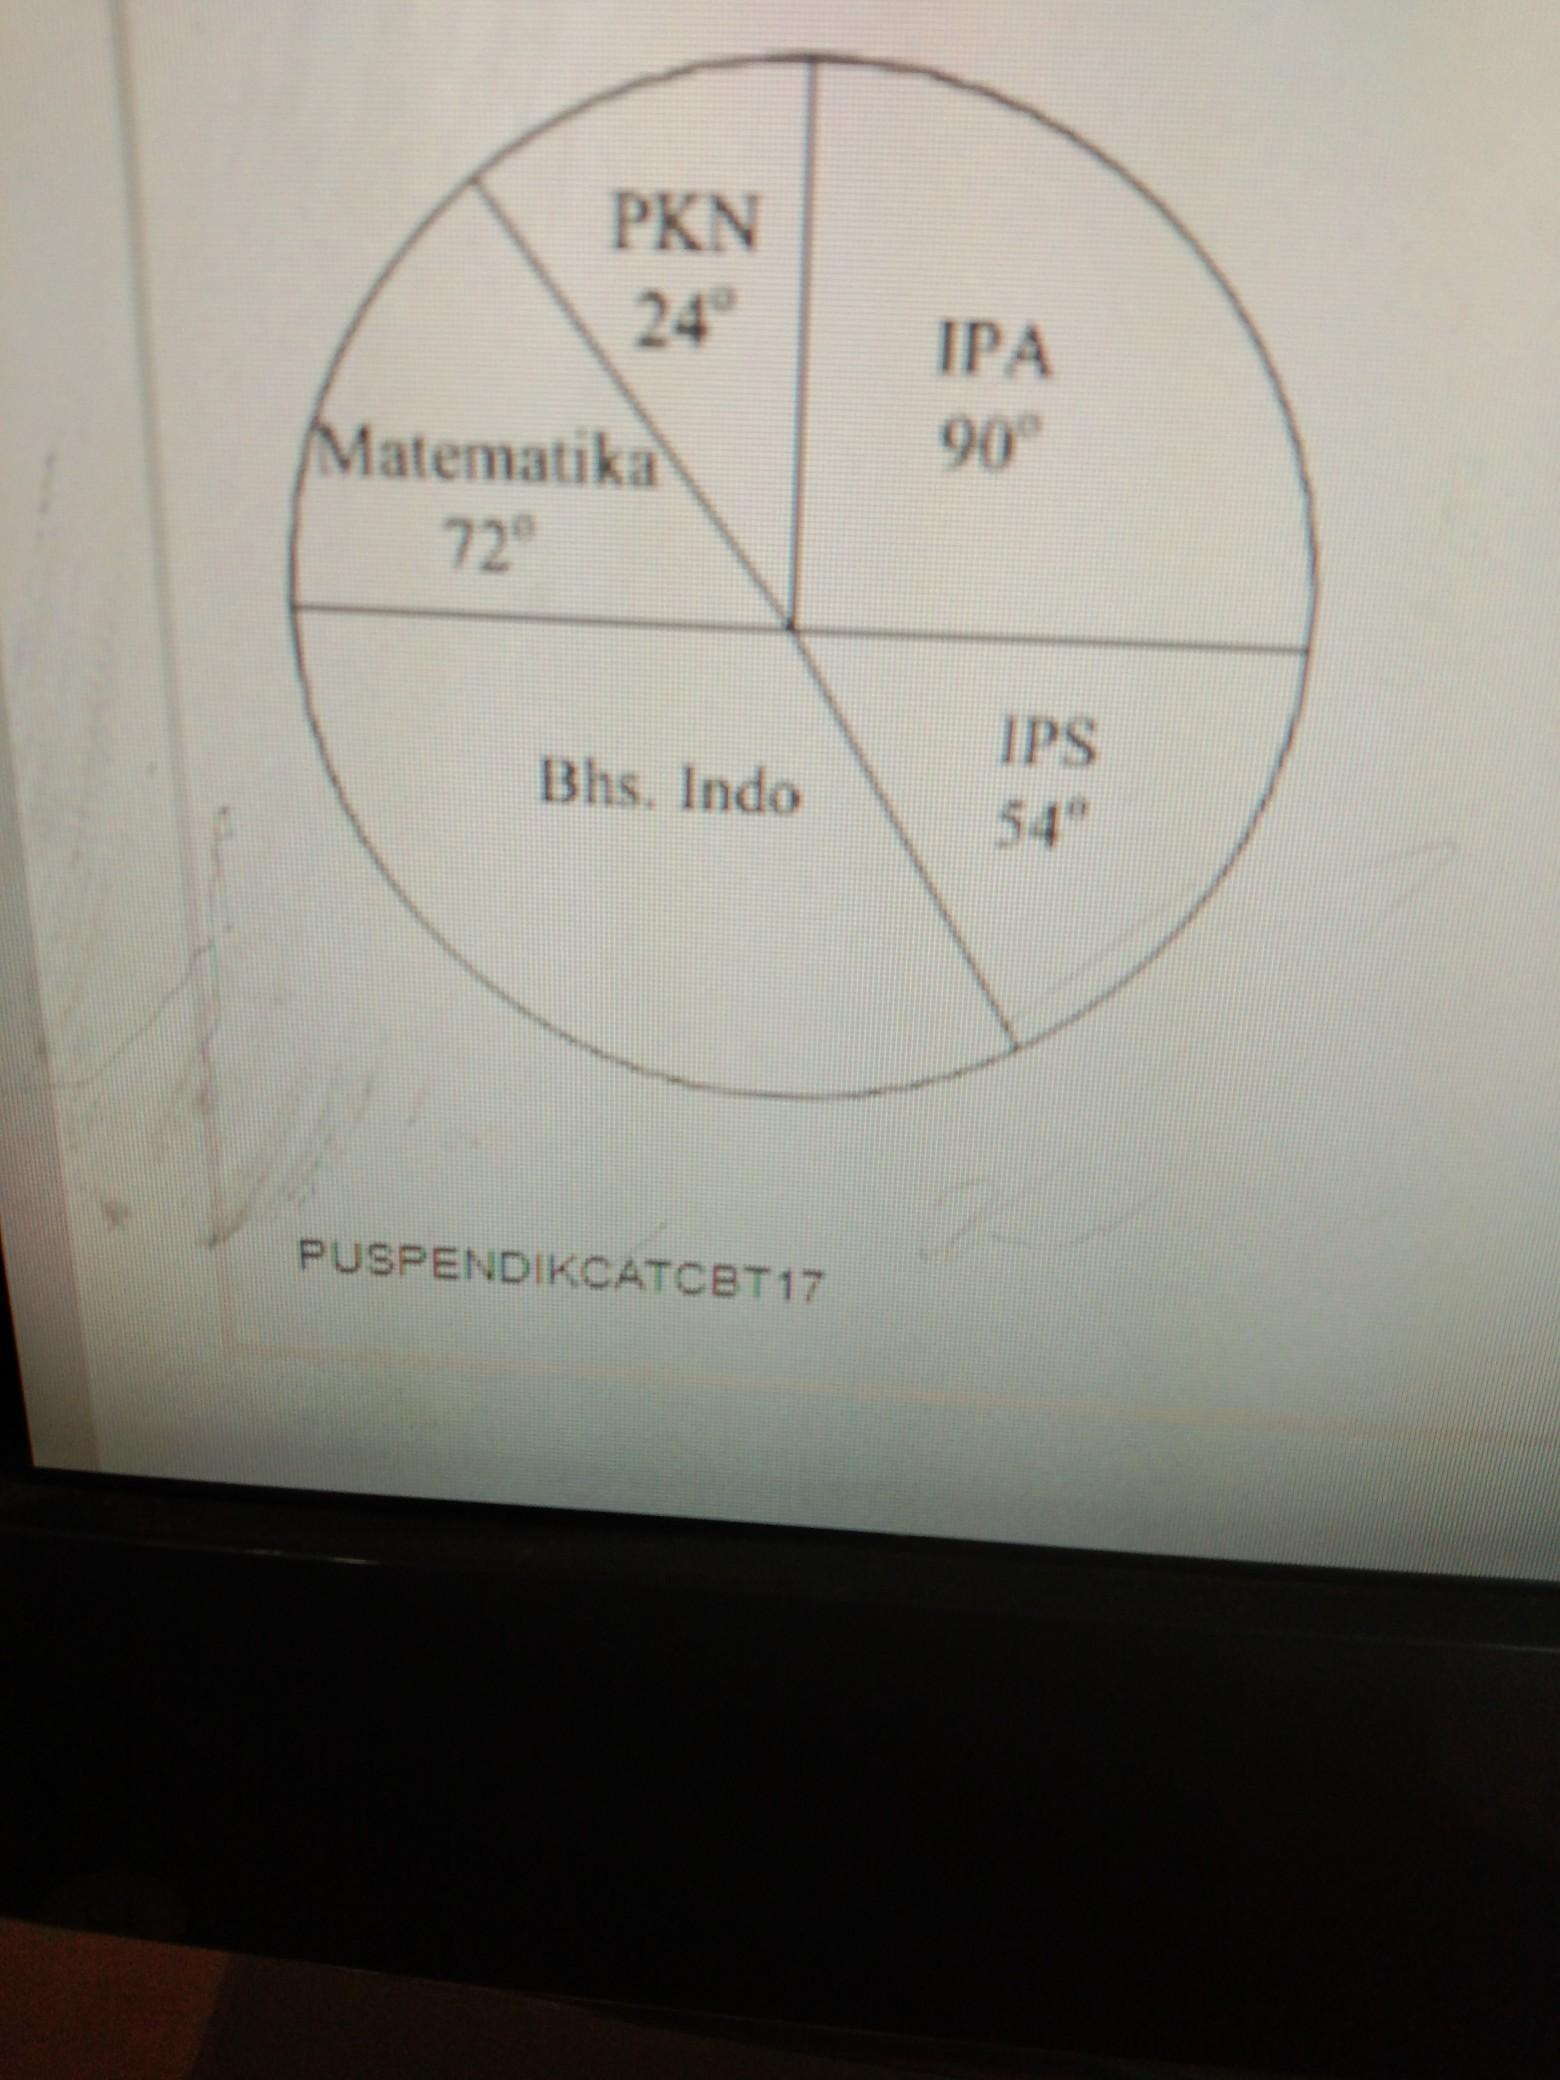 Soal Matematika Kelas 6 Bab Diagram Lingkaran : matematika, kelas, diagram, lingkaran, Diagram, Lingkaran, Disamping, Menunjukan, Banyaknya, Pelajaran, Perpustakaan, Brainly.co.id